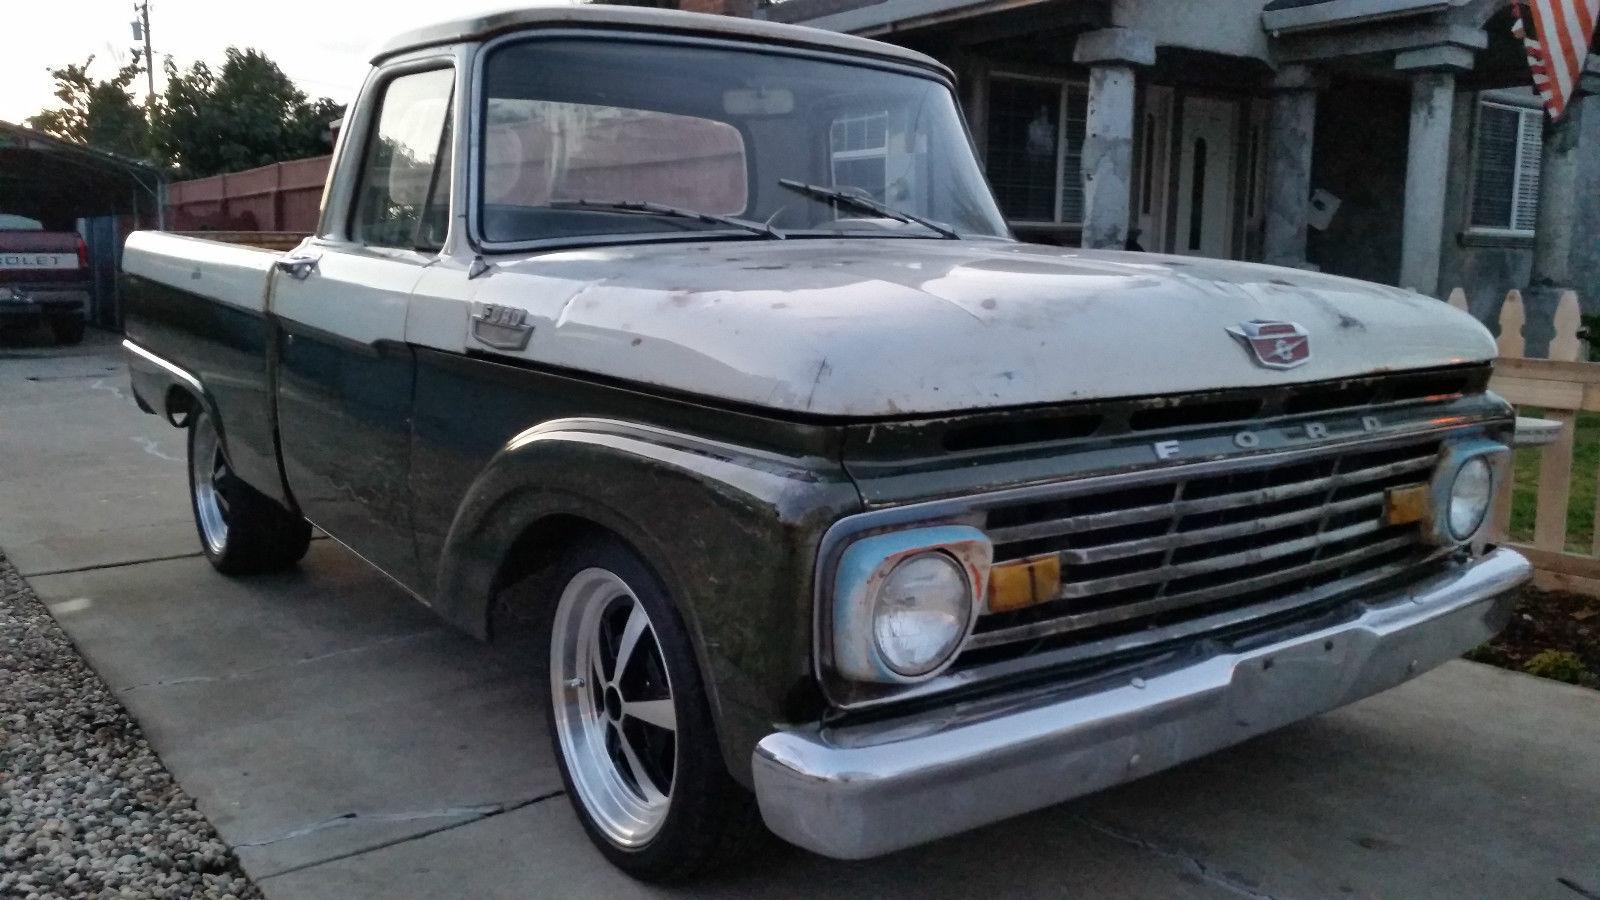 1964 Ford F100 F 100 Custom Cab Patina Shop Truck Fleet Side Short Bed 1970 Ranger Xlt